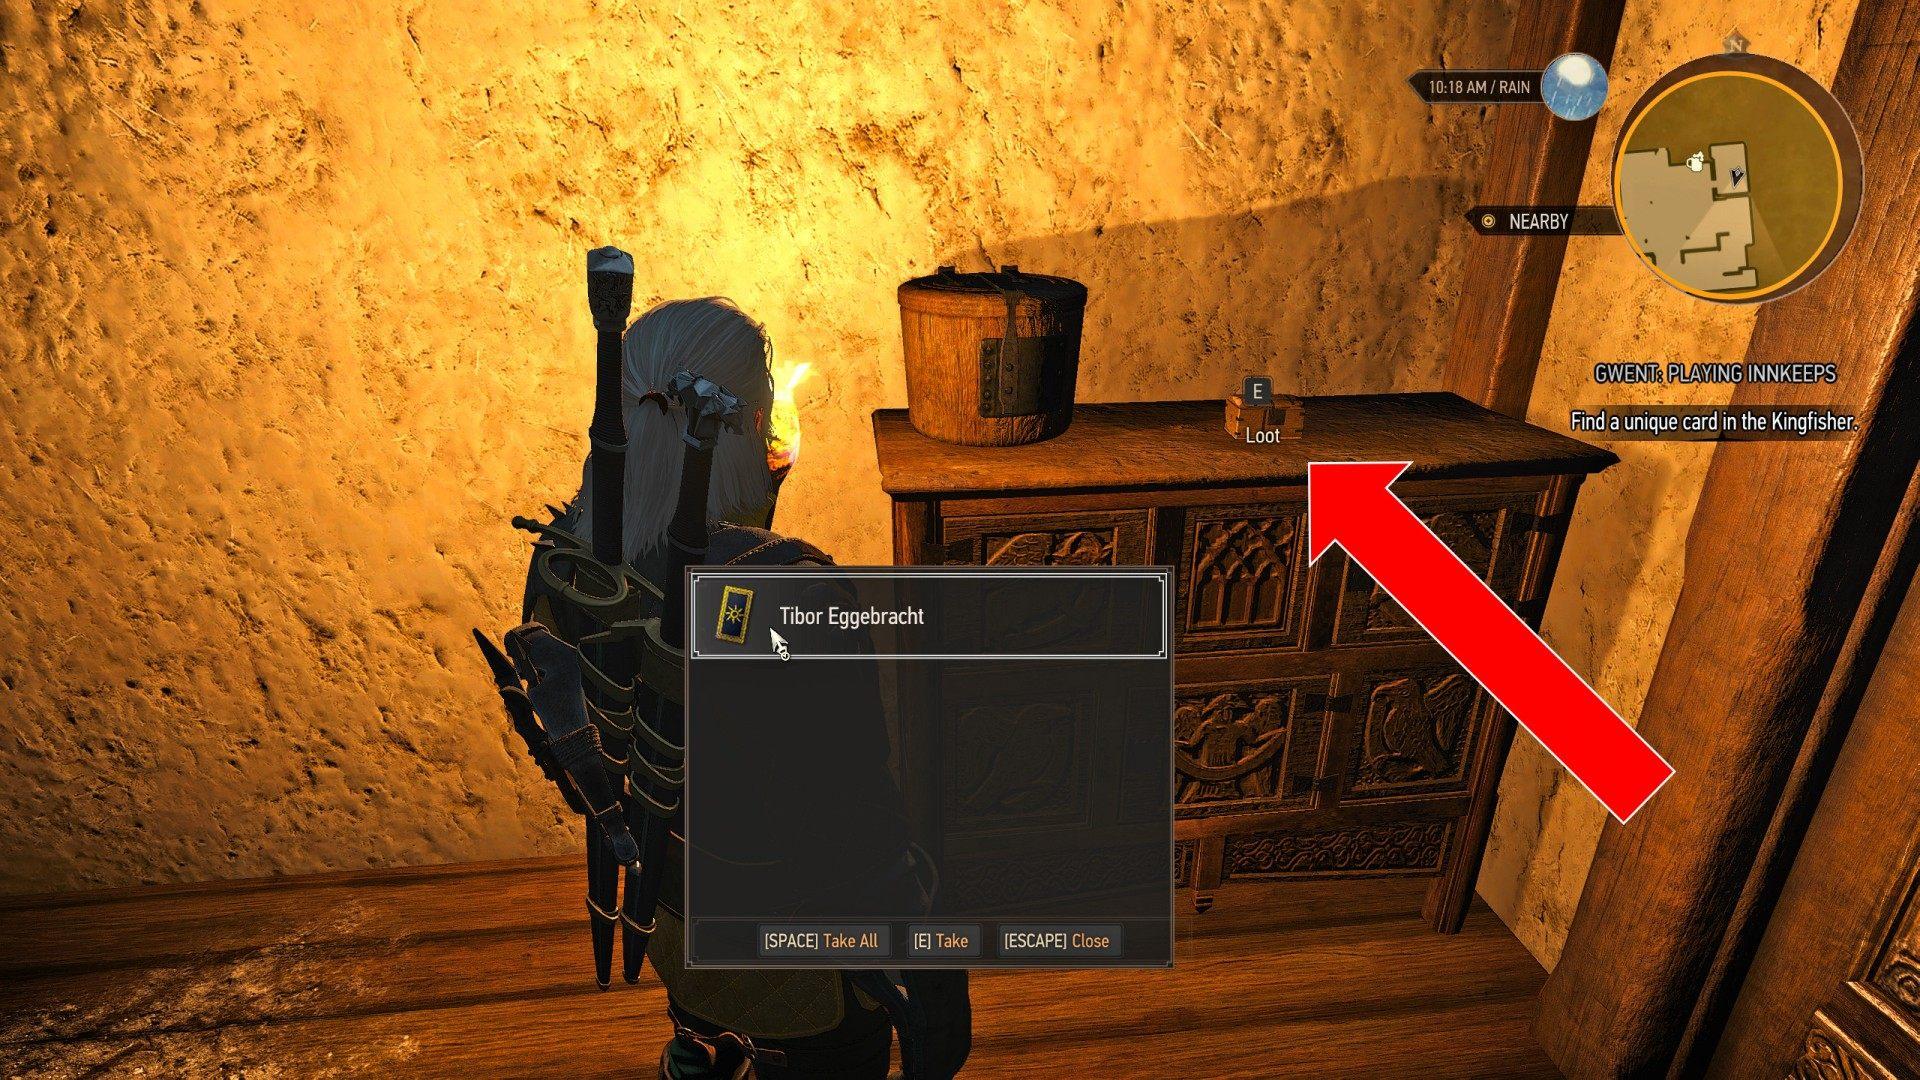 Gwent Playing Innkeeps Witcher 3 Wild Hunt Quest